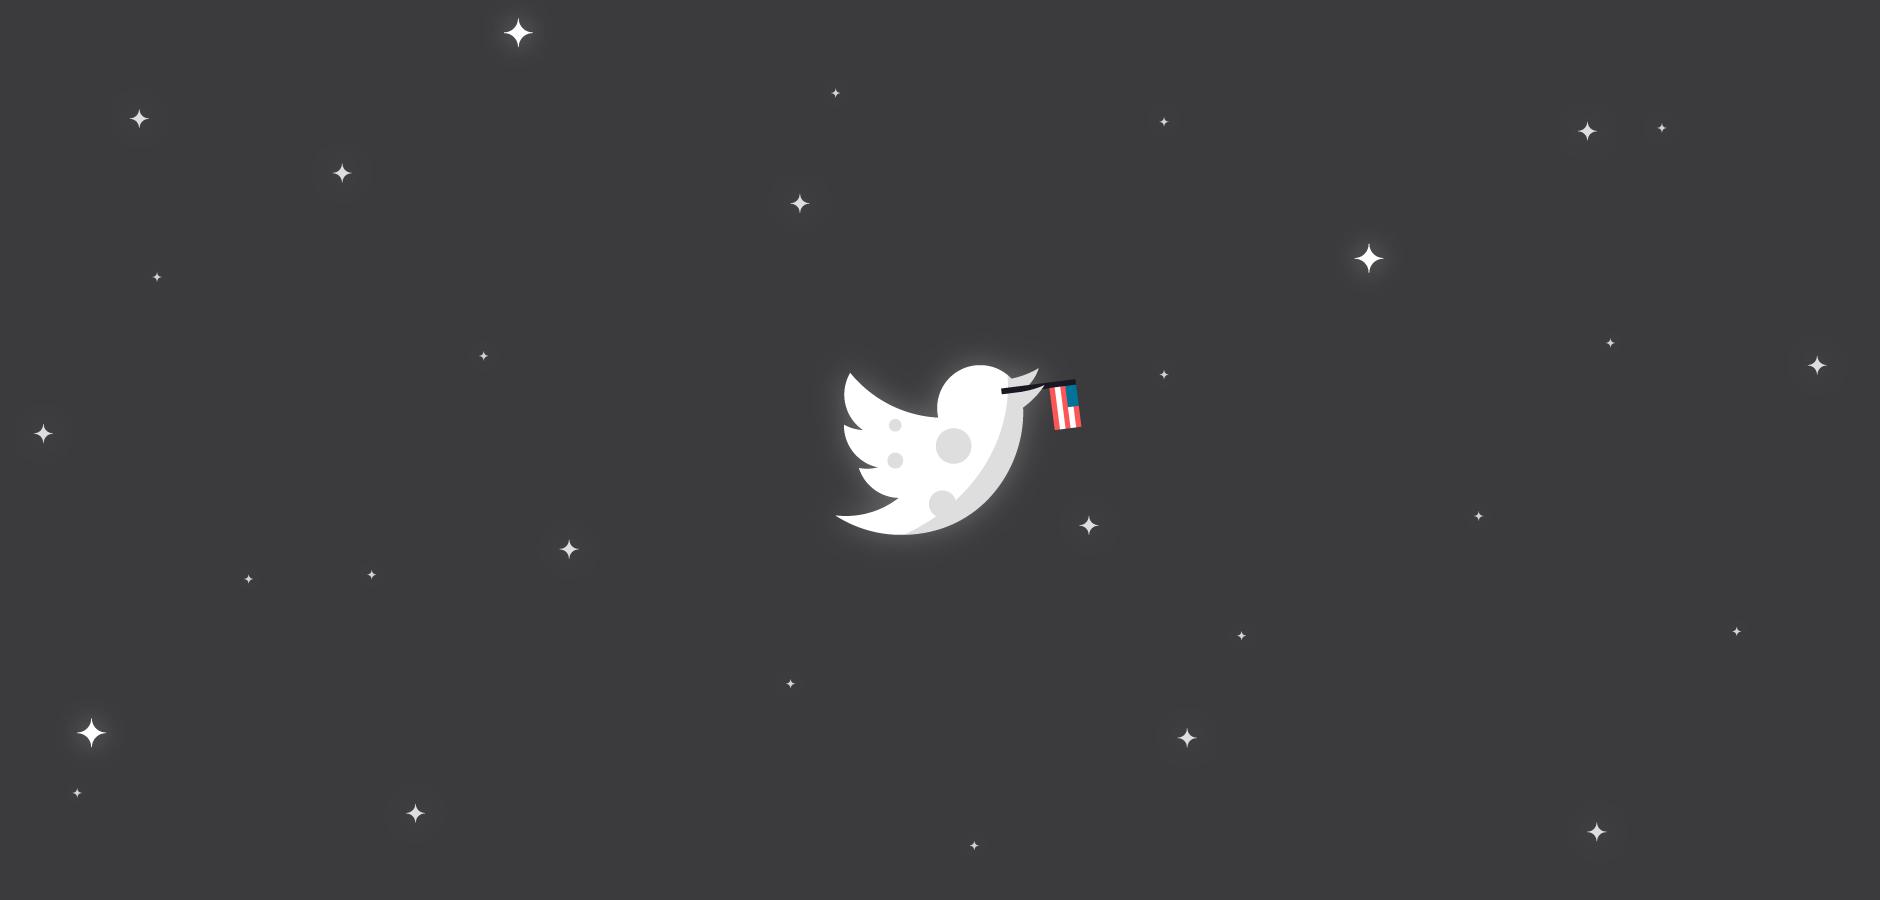 Dot Pixel - Illustration - Twitterverse